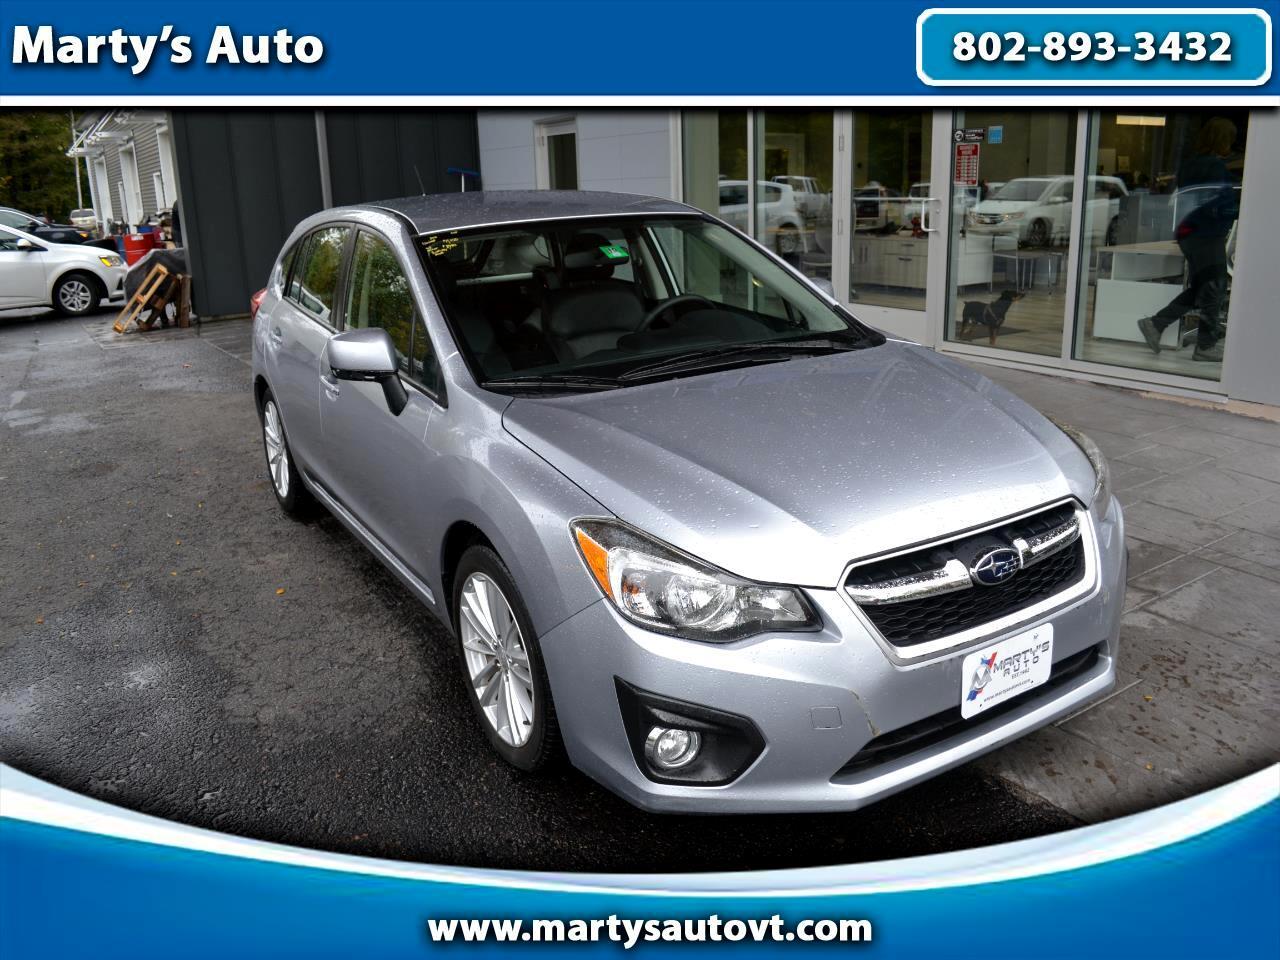 2012 Subaru Impreza 5dr Auto 2.0i Limited